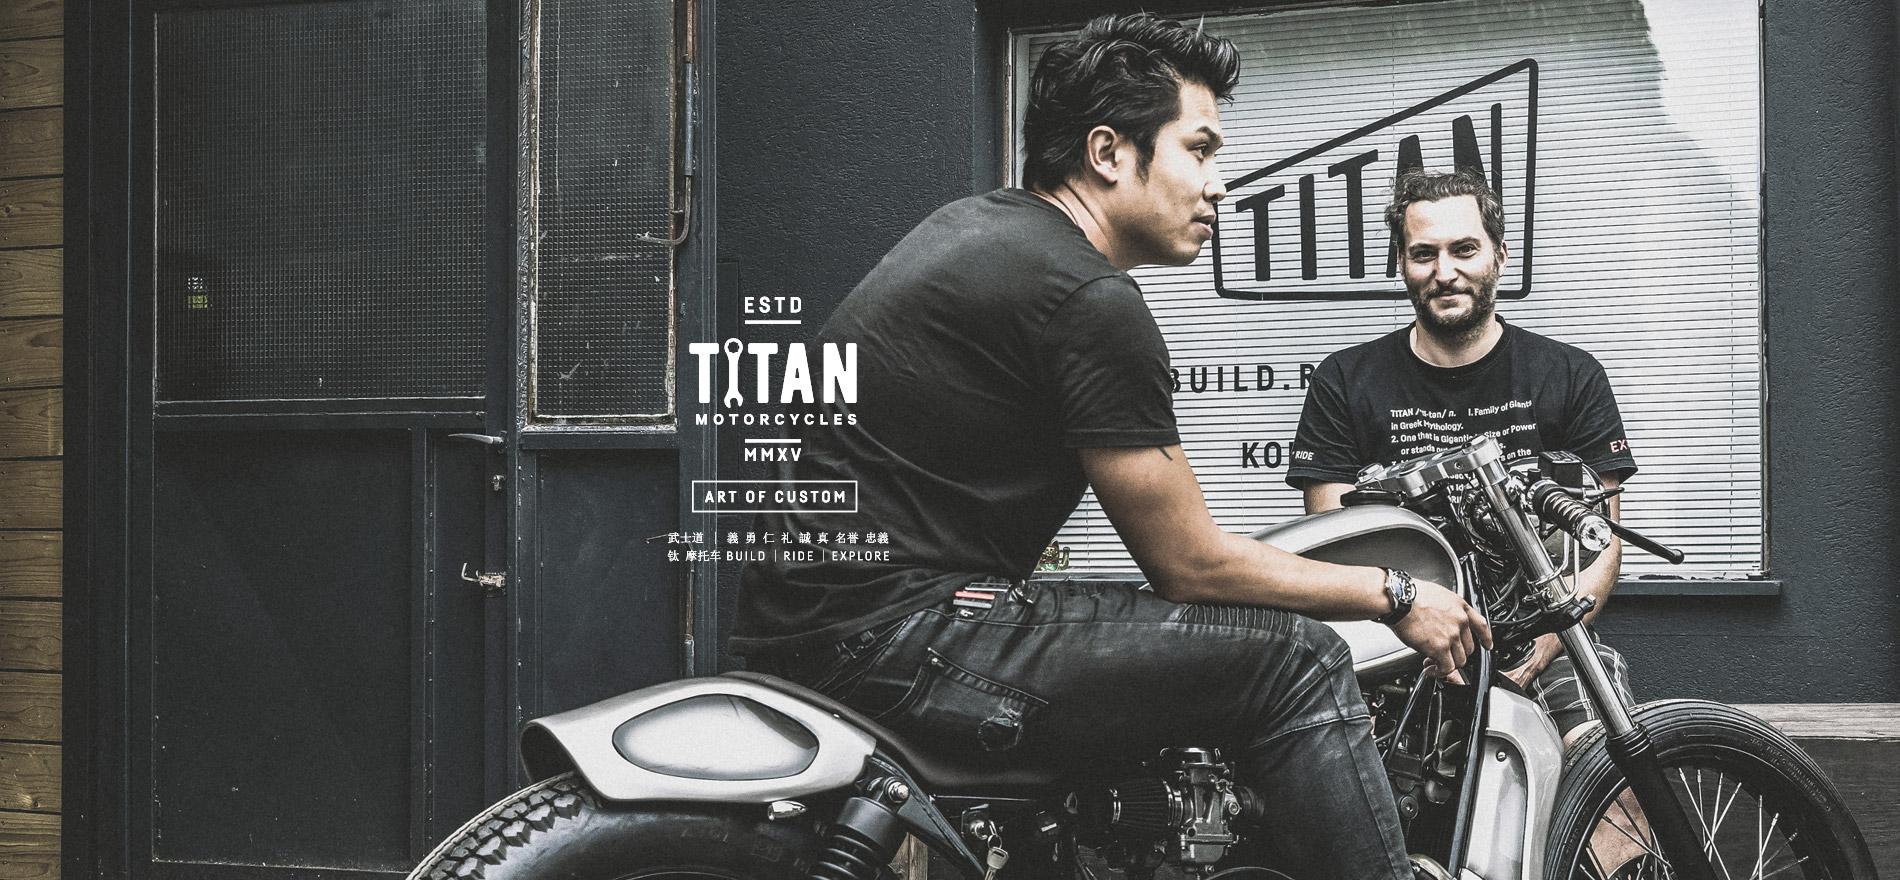 TITAN-Motorcycle-Co-Graz-Austria-Custom-Bike-Cafe-Racer-Graz-Austria-Motorrad-Umbau-Steiermark-Styria